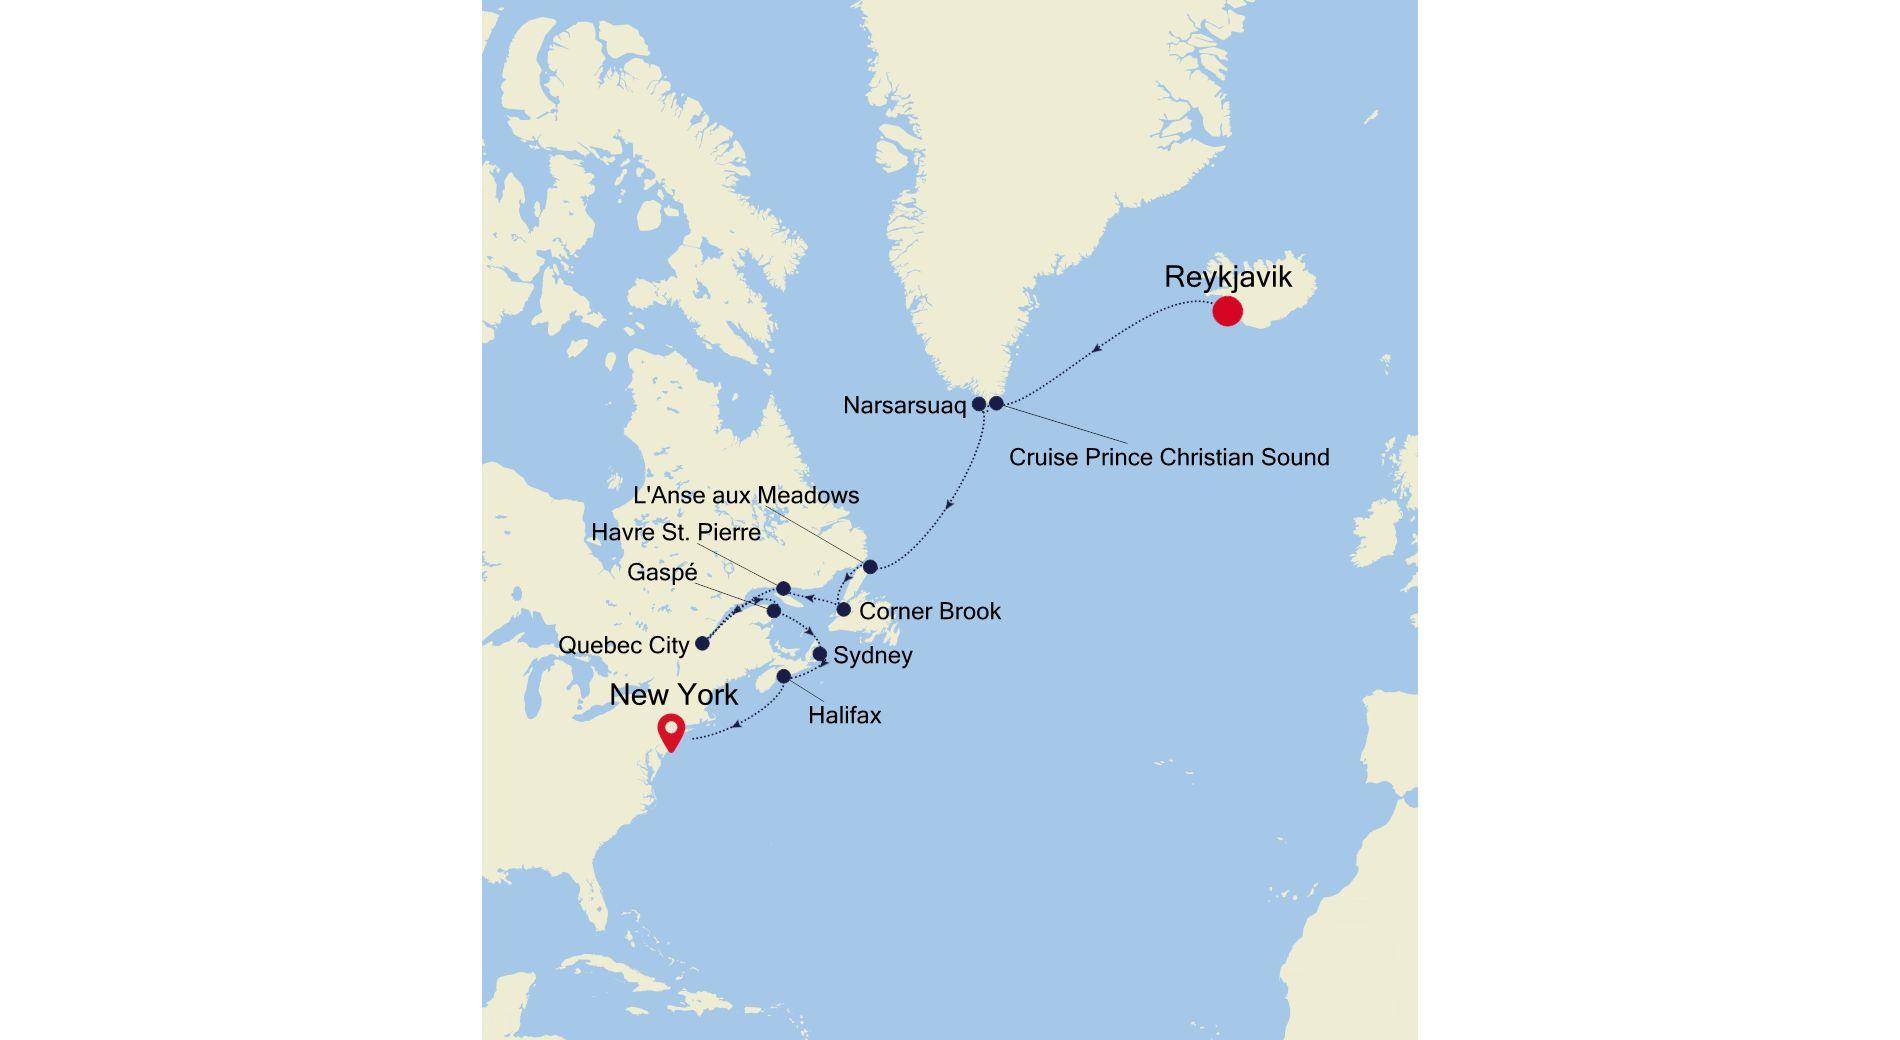 WH210831016 - Reykjavik a New York